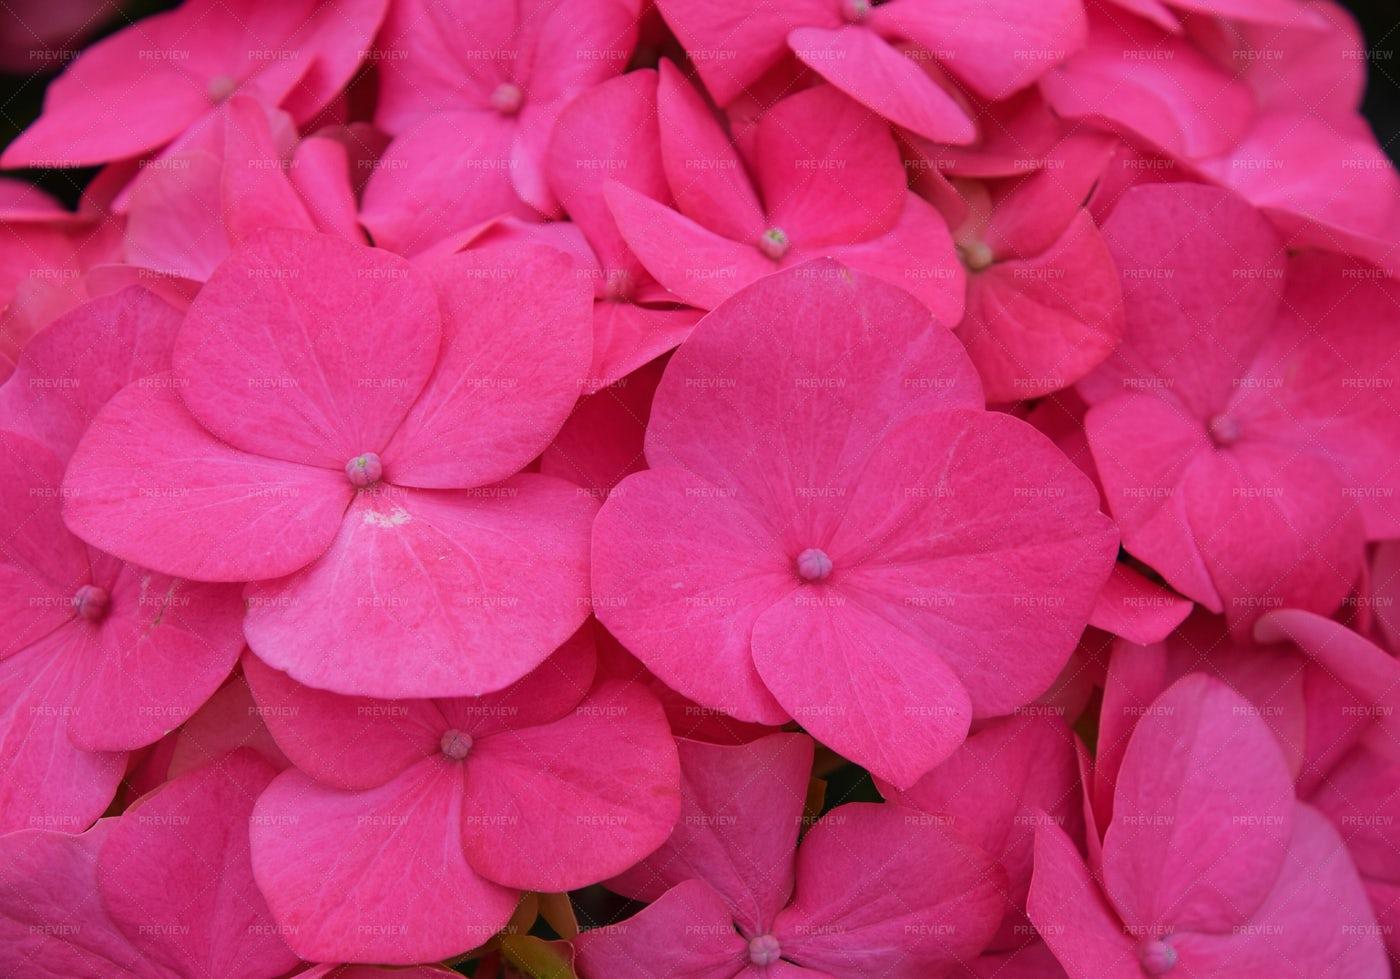 Pink Hortensia Flowers: Stock Photos